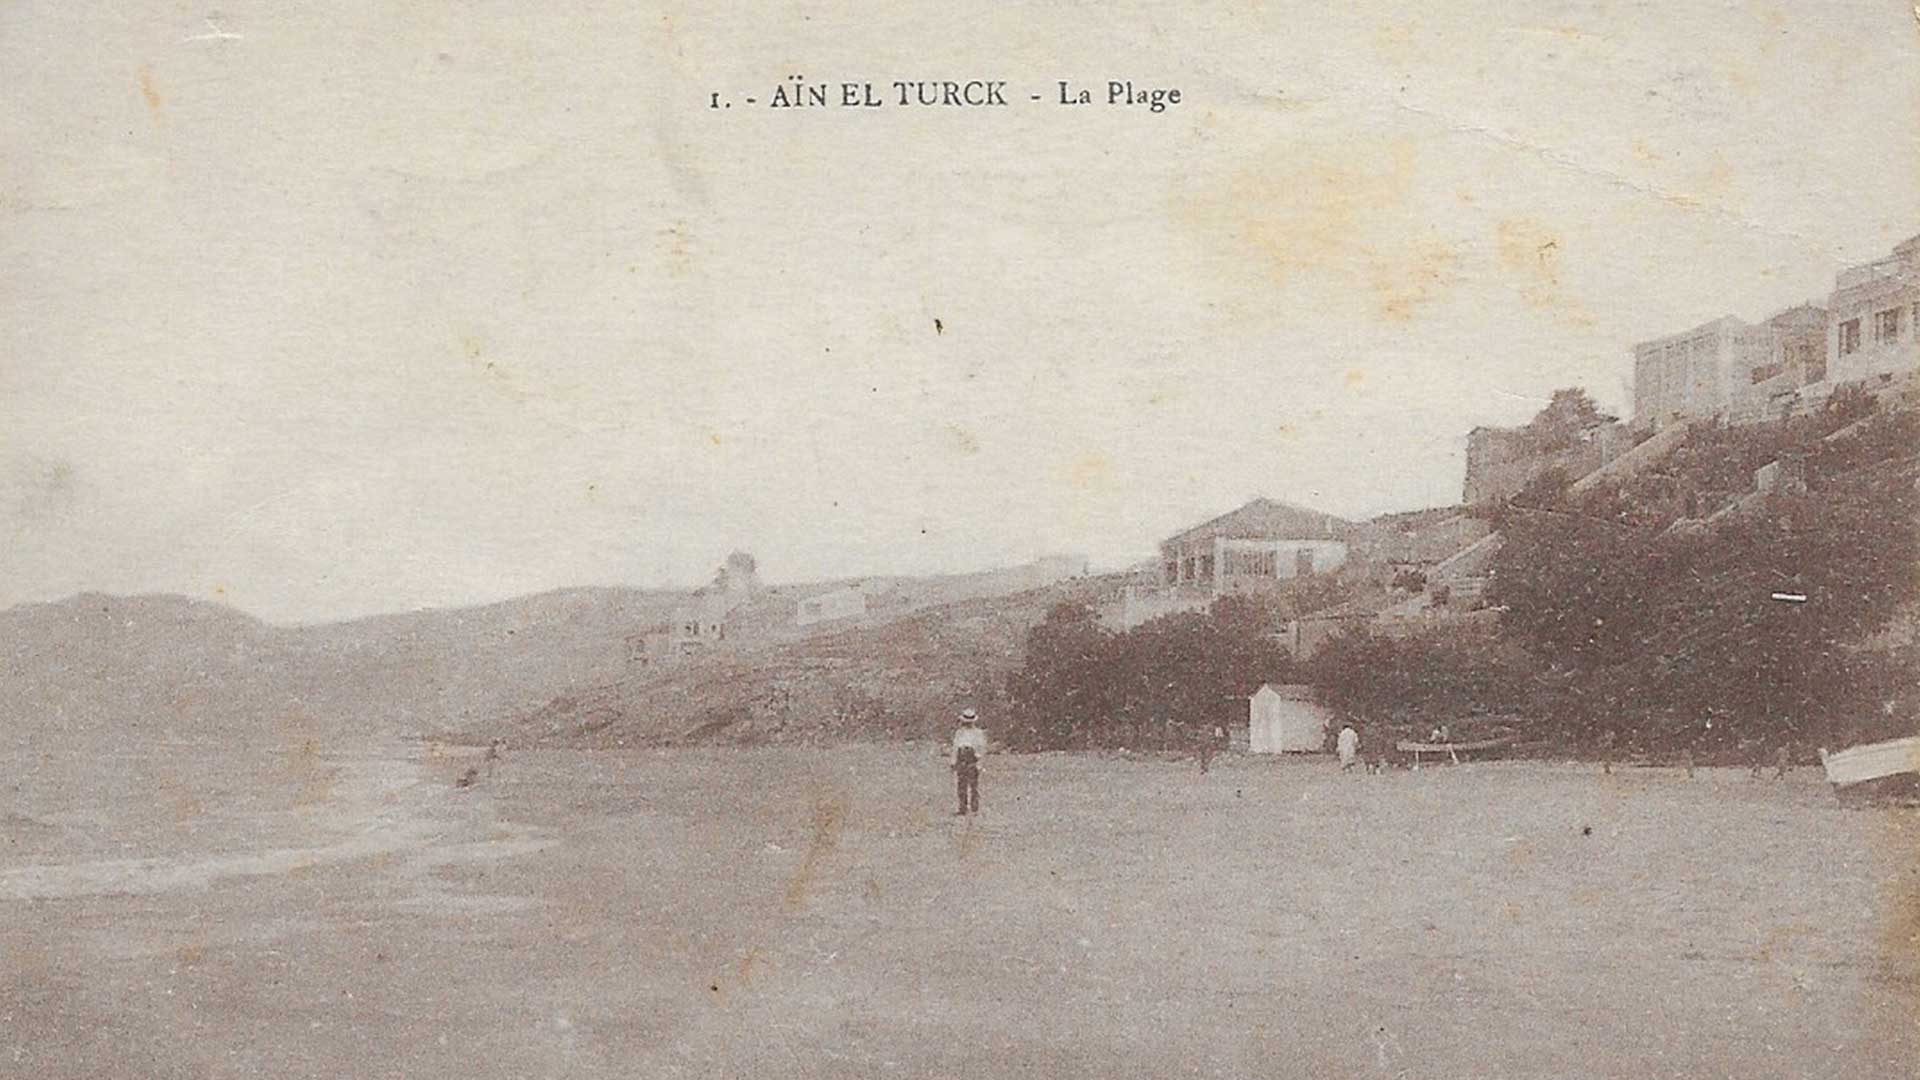 Ain-El-Turck-Plage